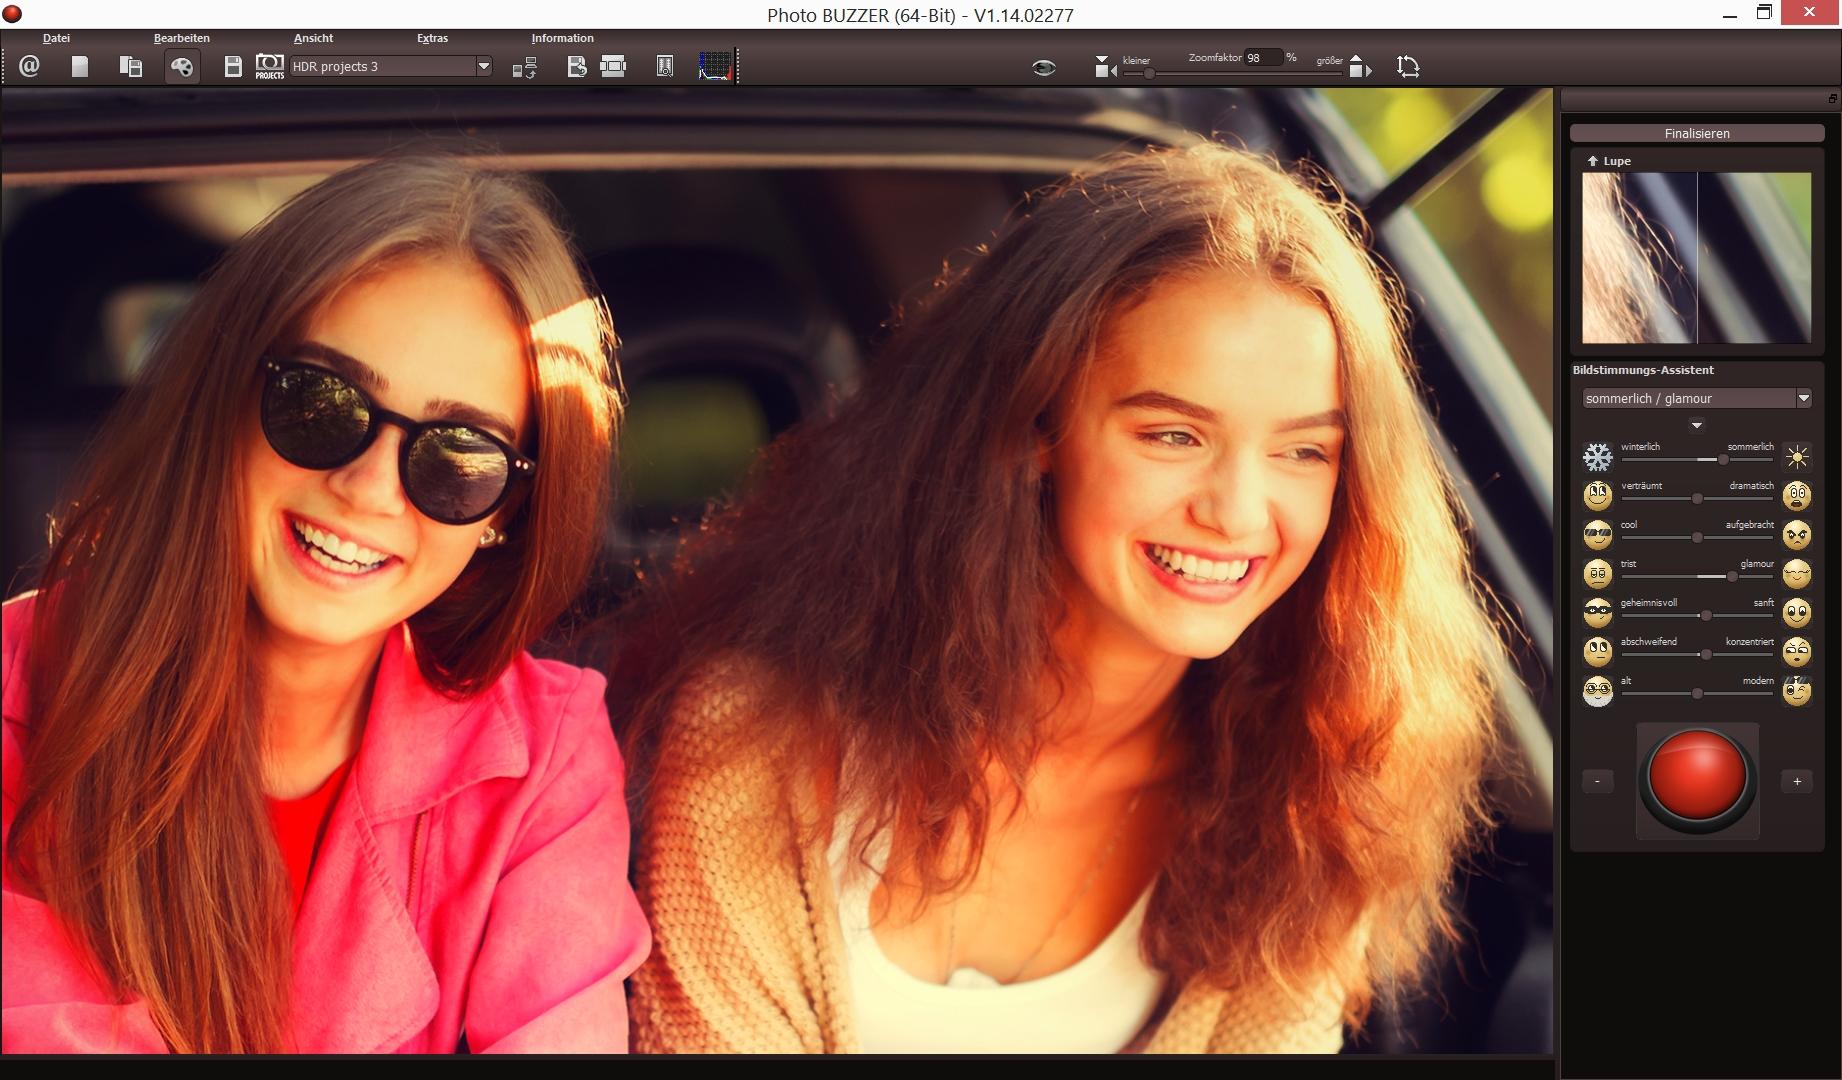 Design, Photo & Graphics Software, PhotoBuzzer Screenshot